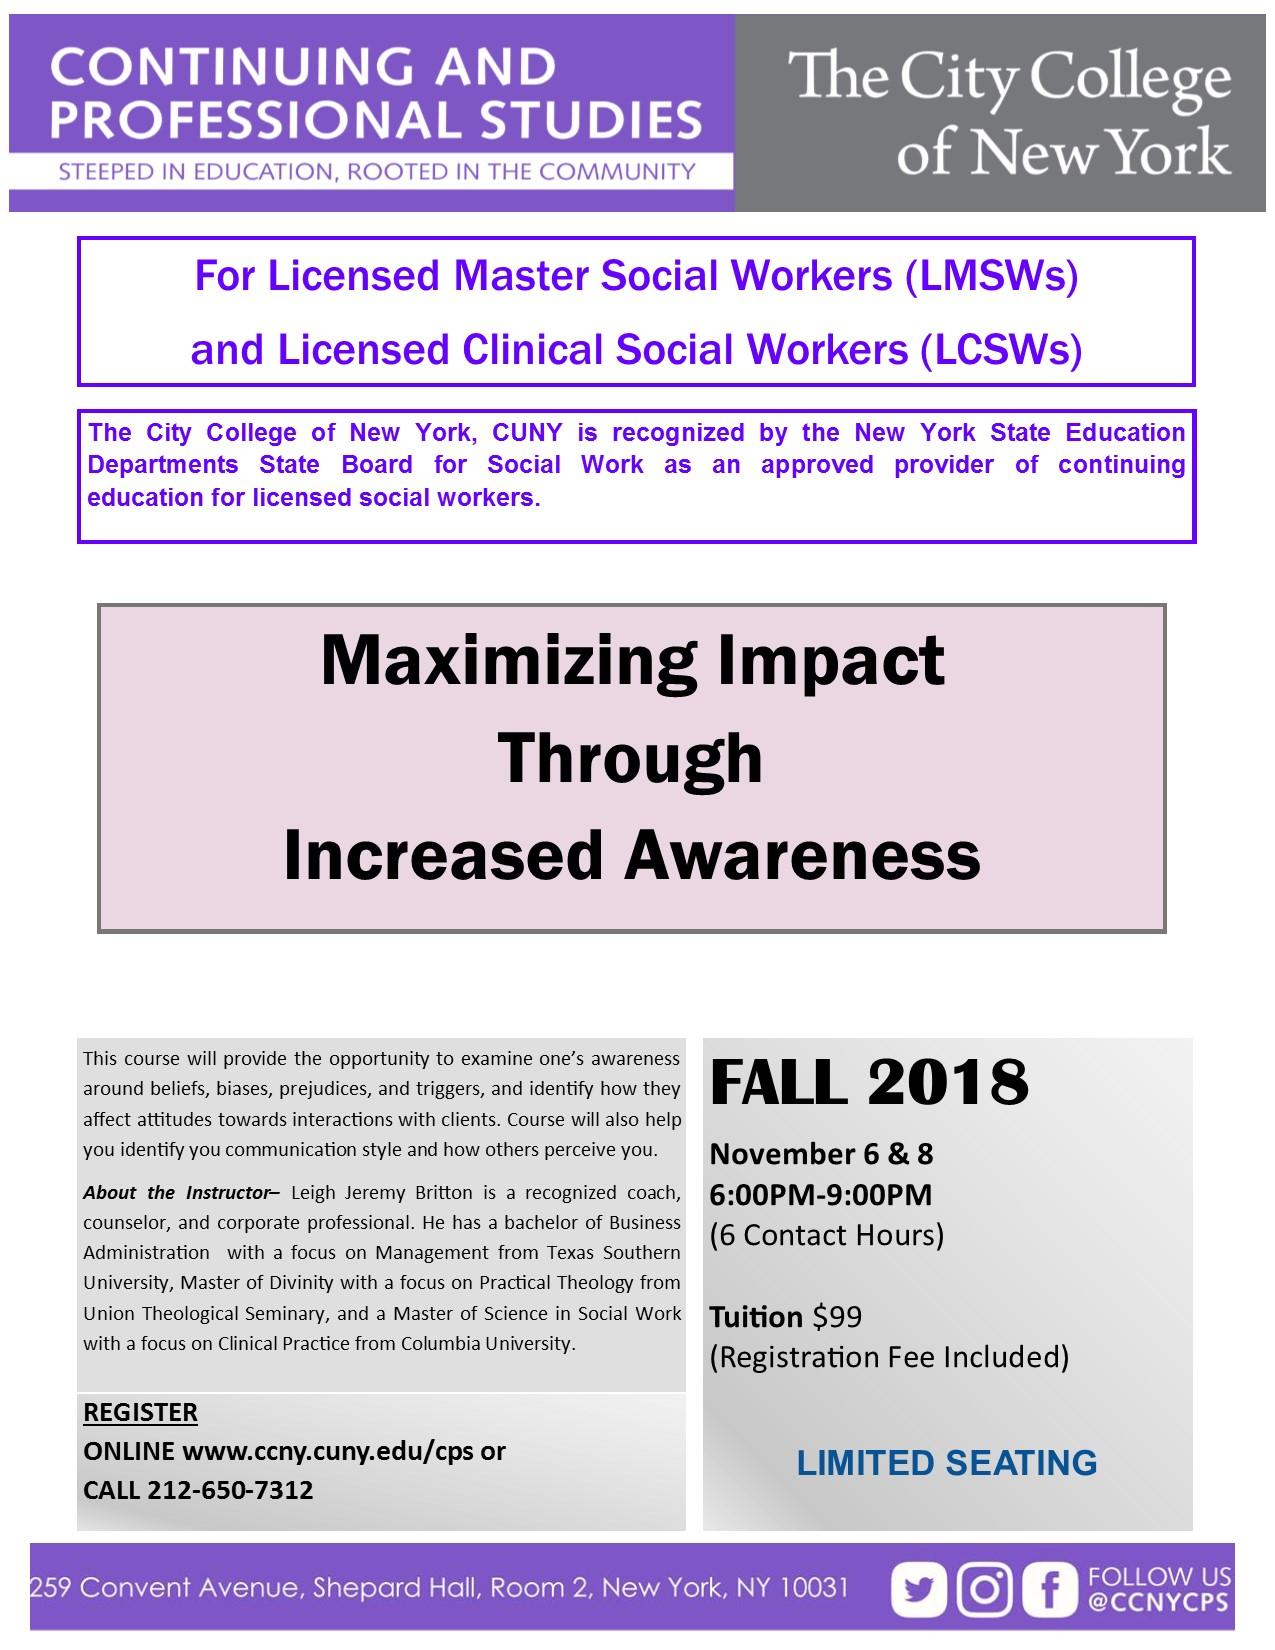 Maximizing Impact Through Increased Awareness